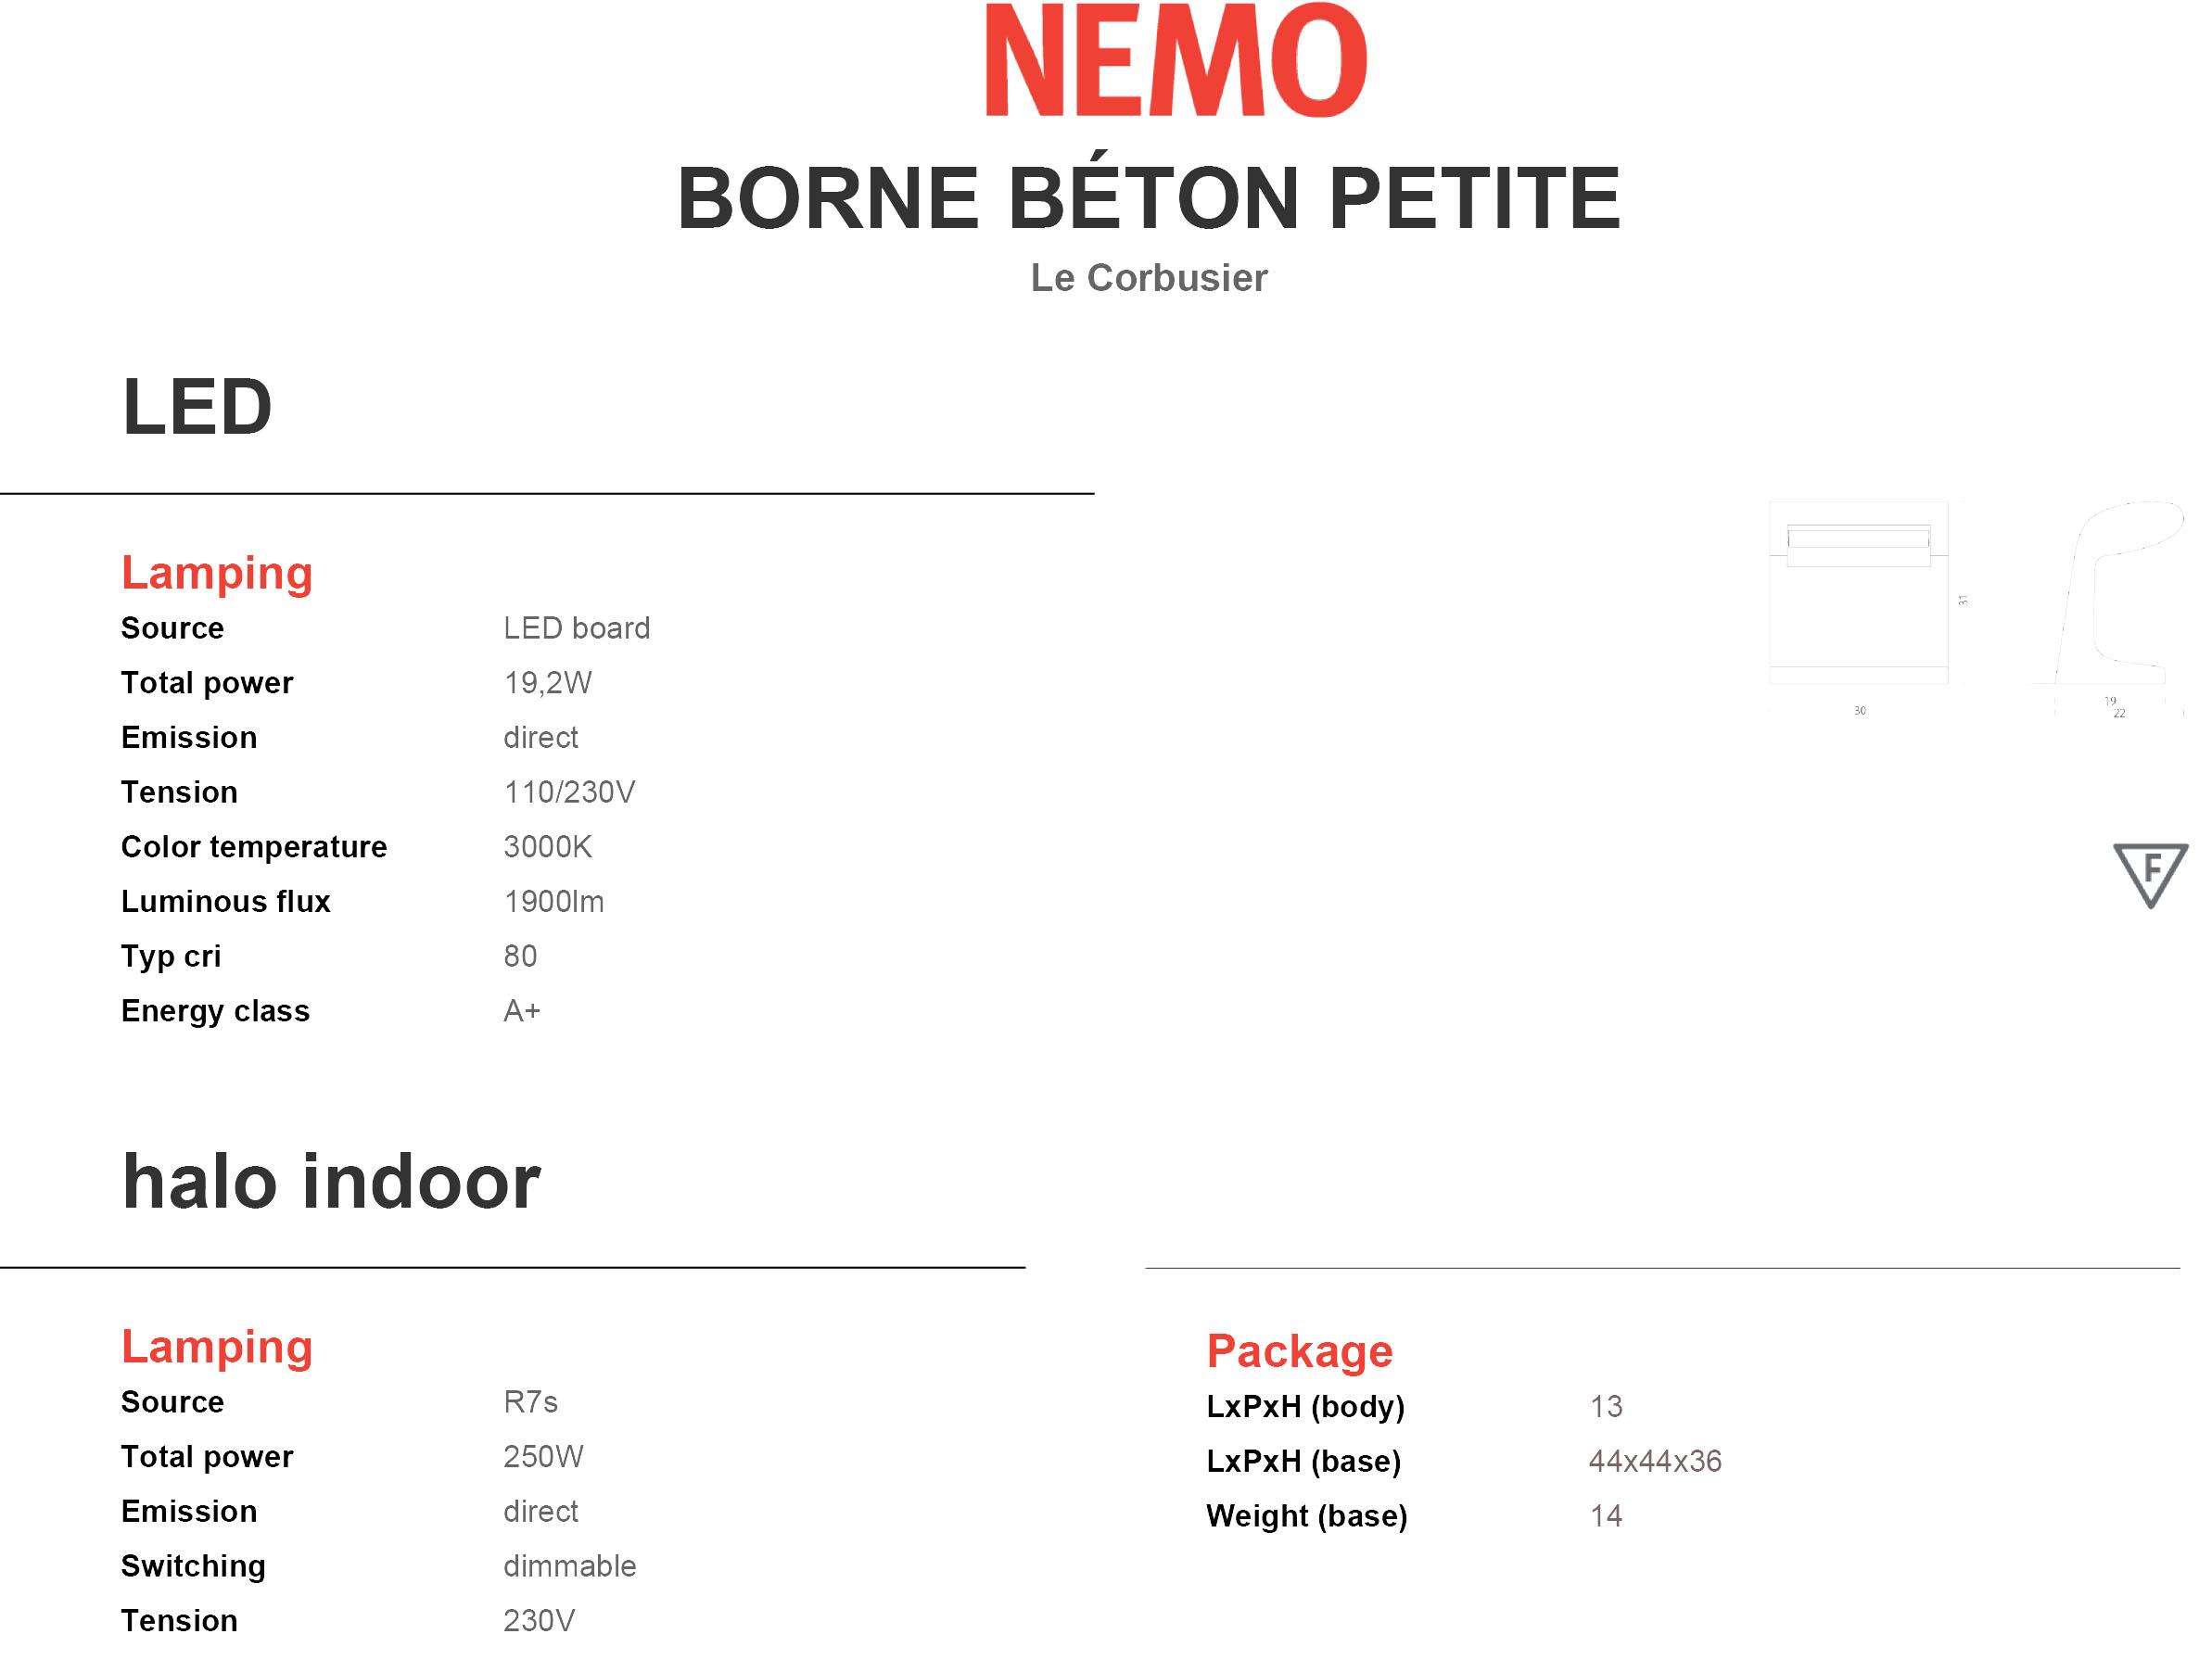 Nemo Borne Béton Petite